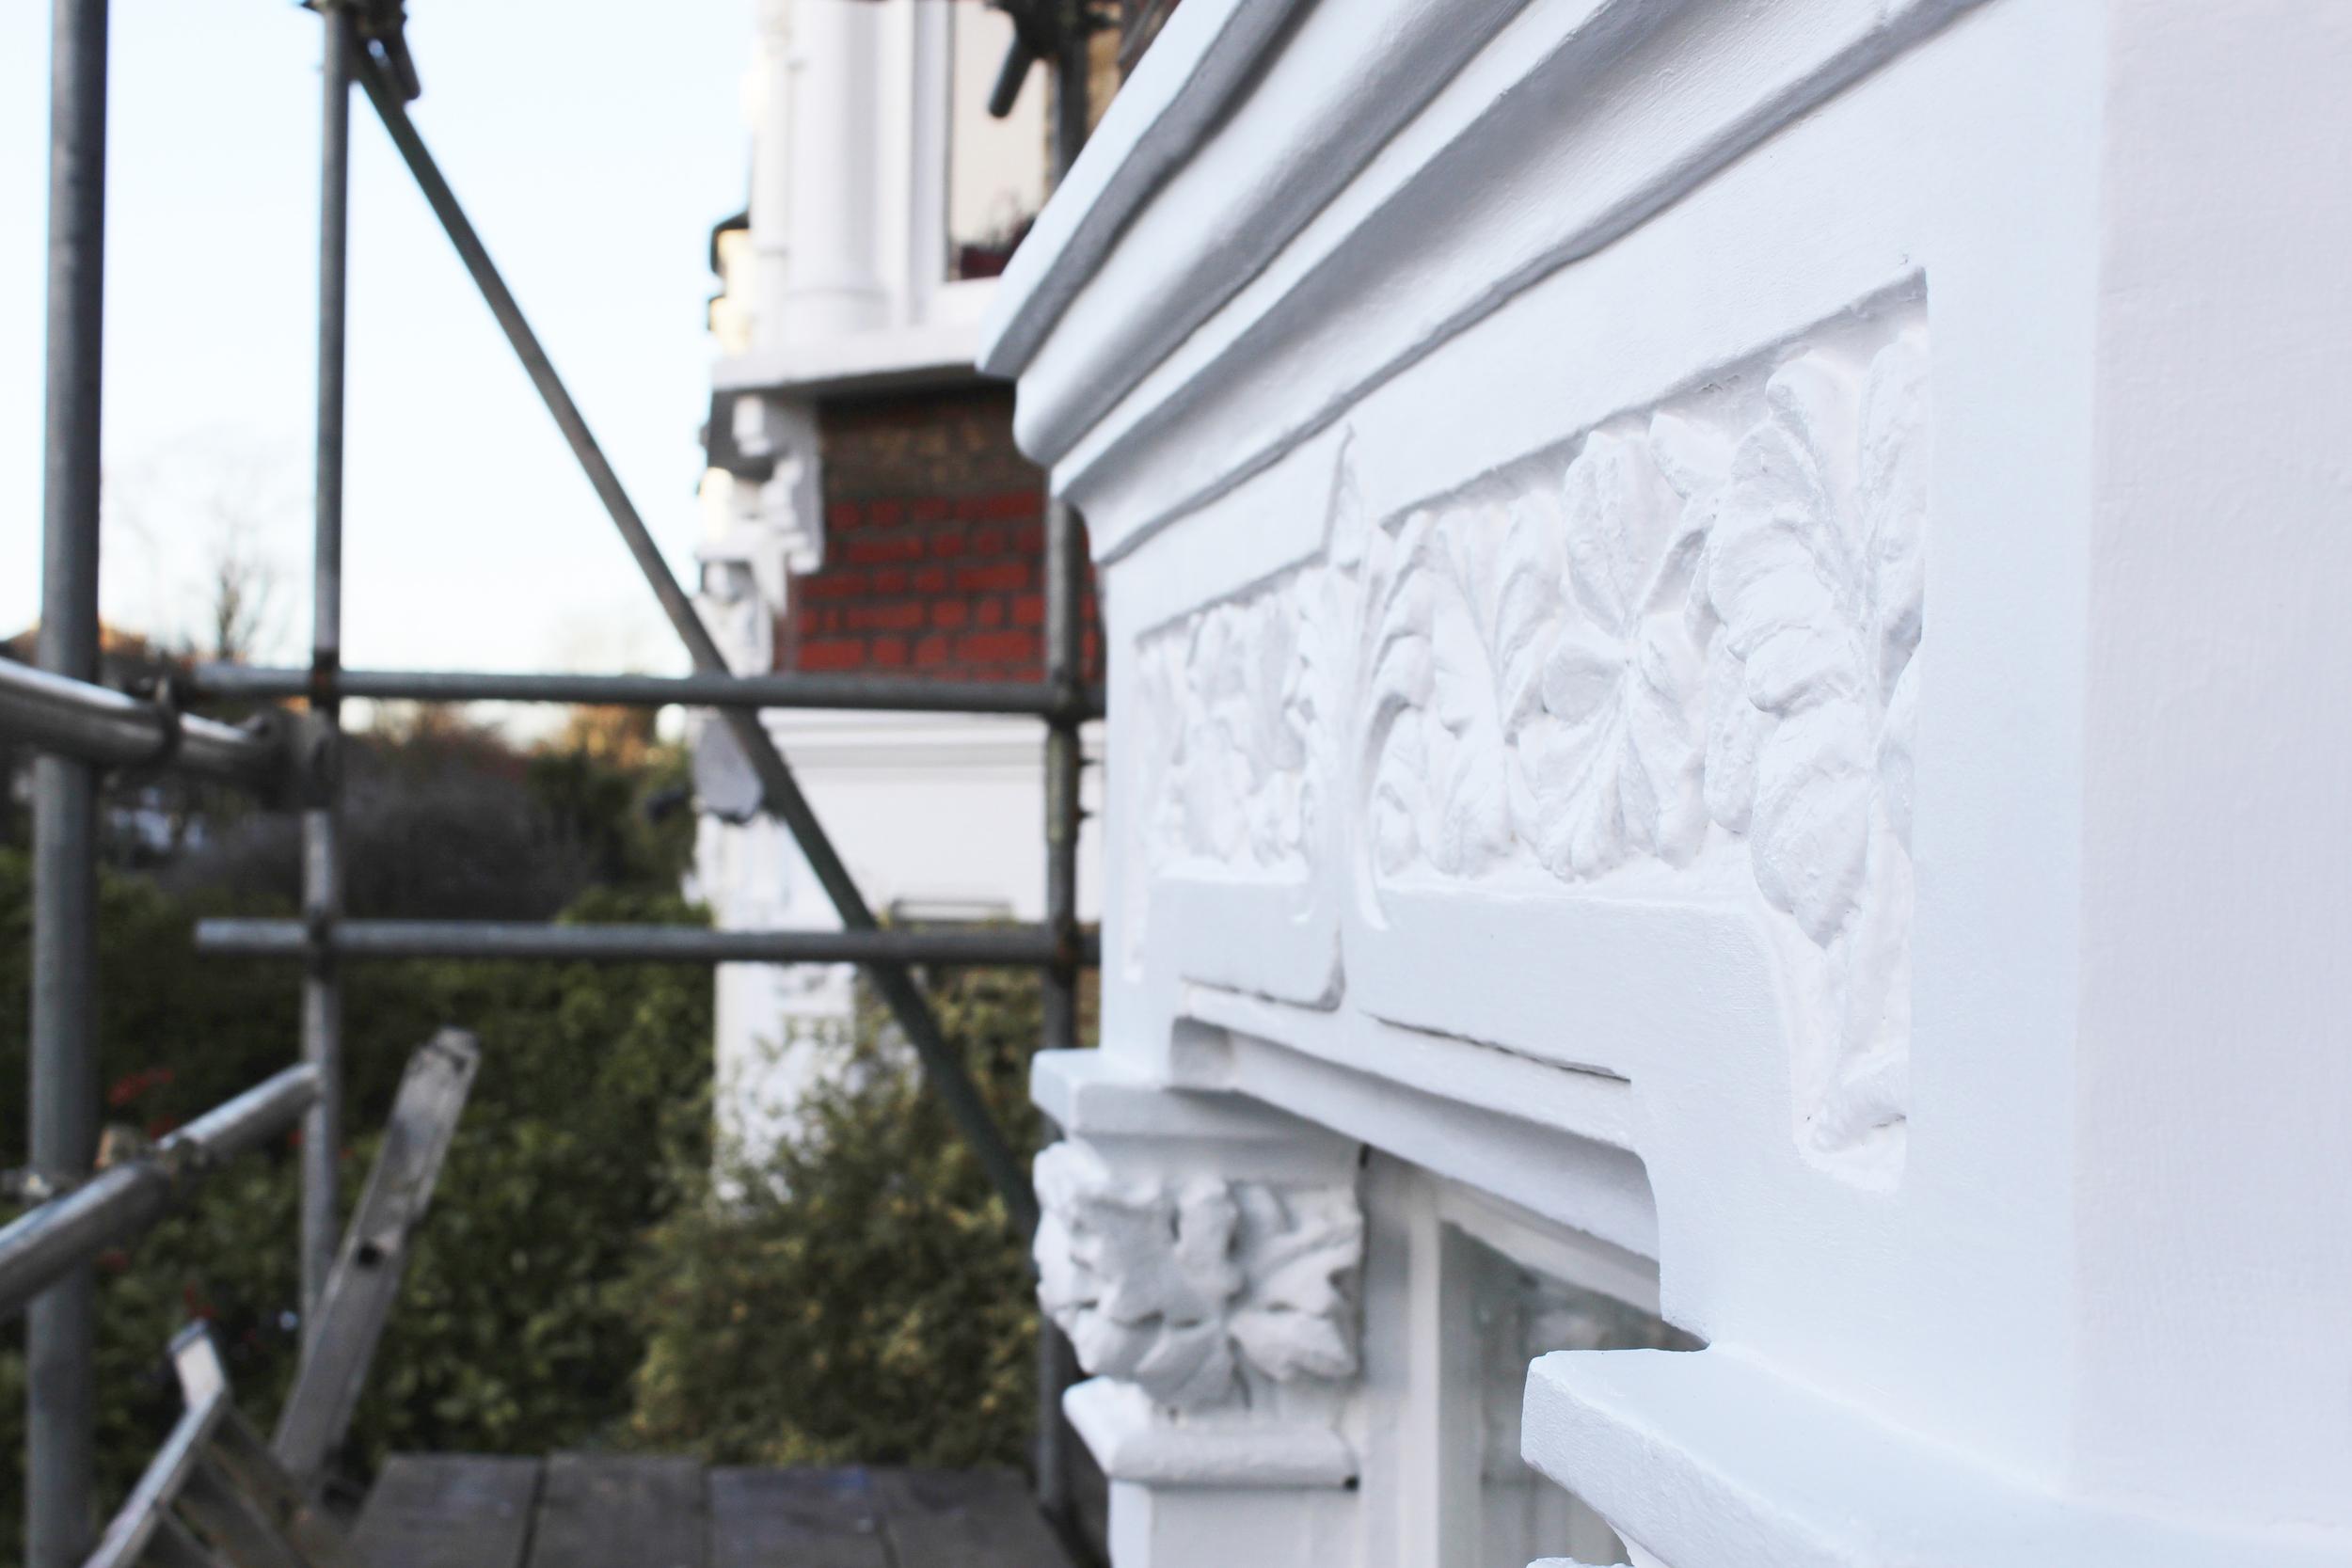 #NHRenovations #Painter #Decorator #London #TufnellPark #Exterior #Victorian #Sash #Windows #Sandtex #White #Masonry